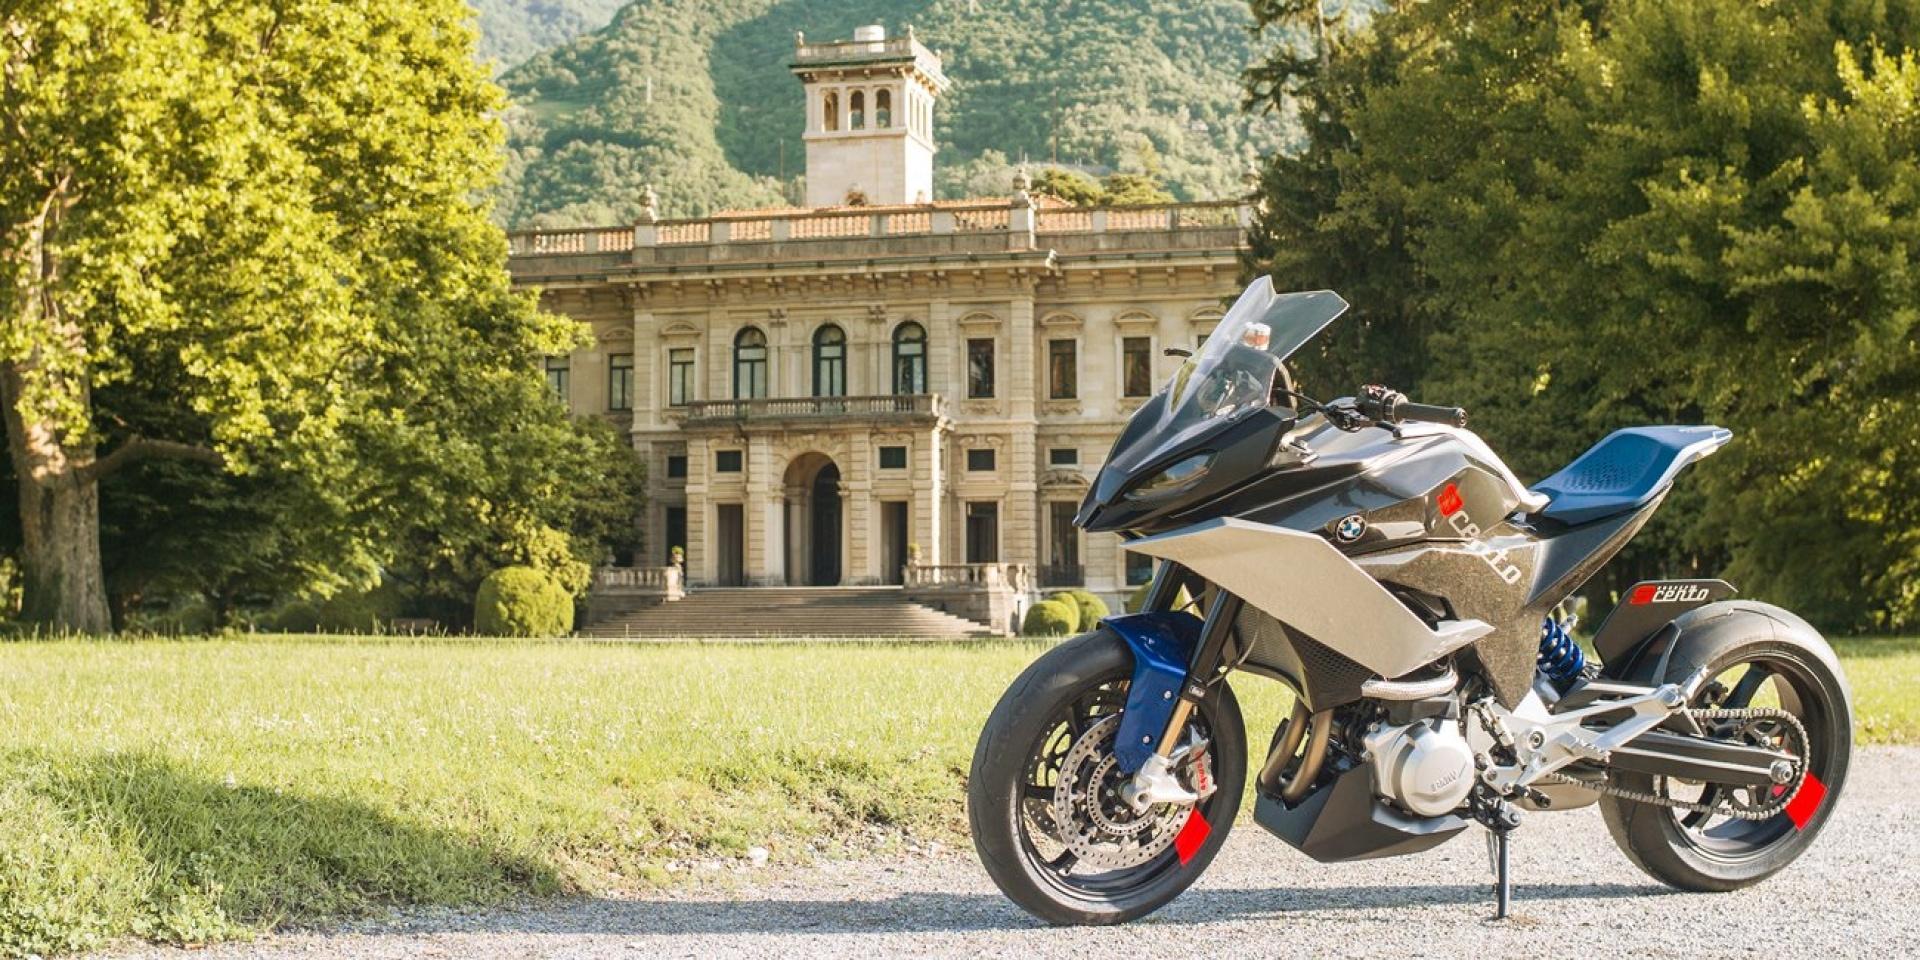 性能、實用同時再進化,BMW Motorrad Concept 9cento登場